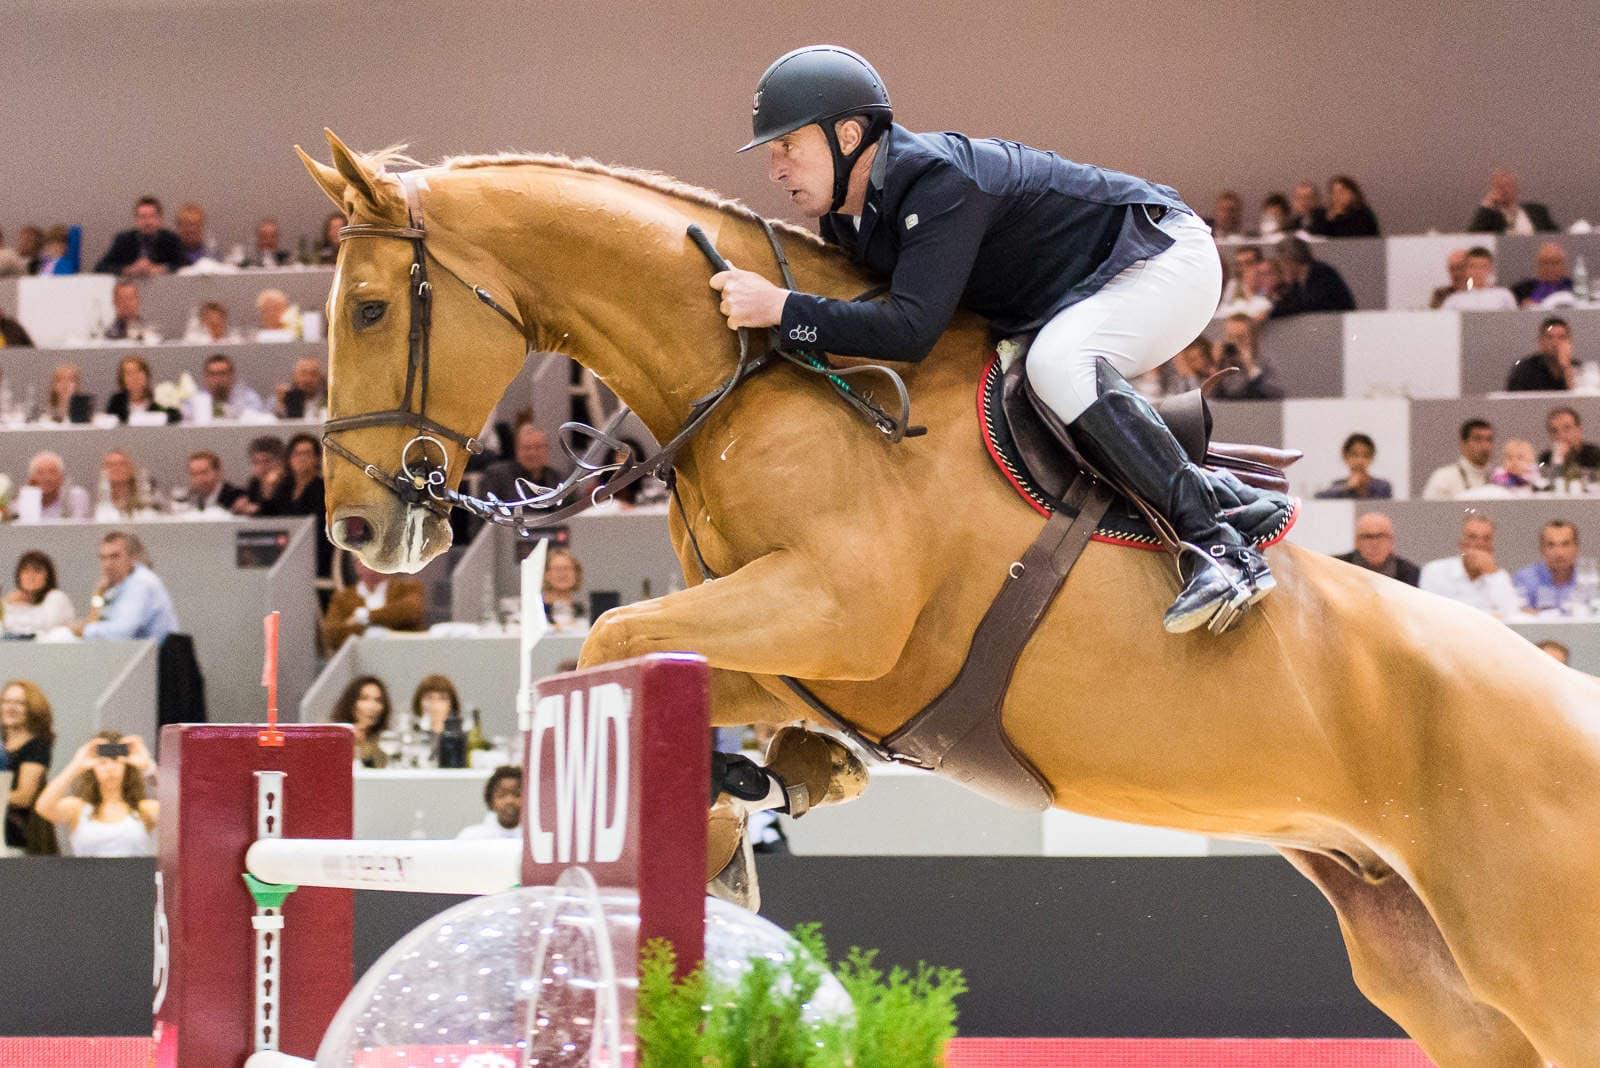 Roger Yvest Bost Credit Suisse Grand Prix 2015